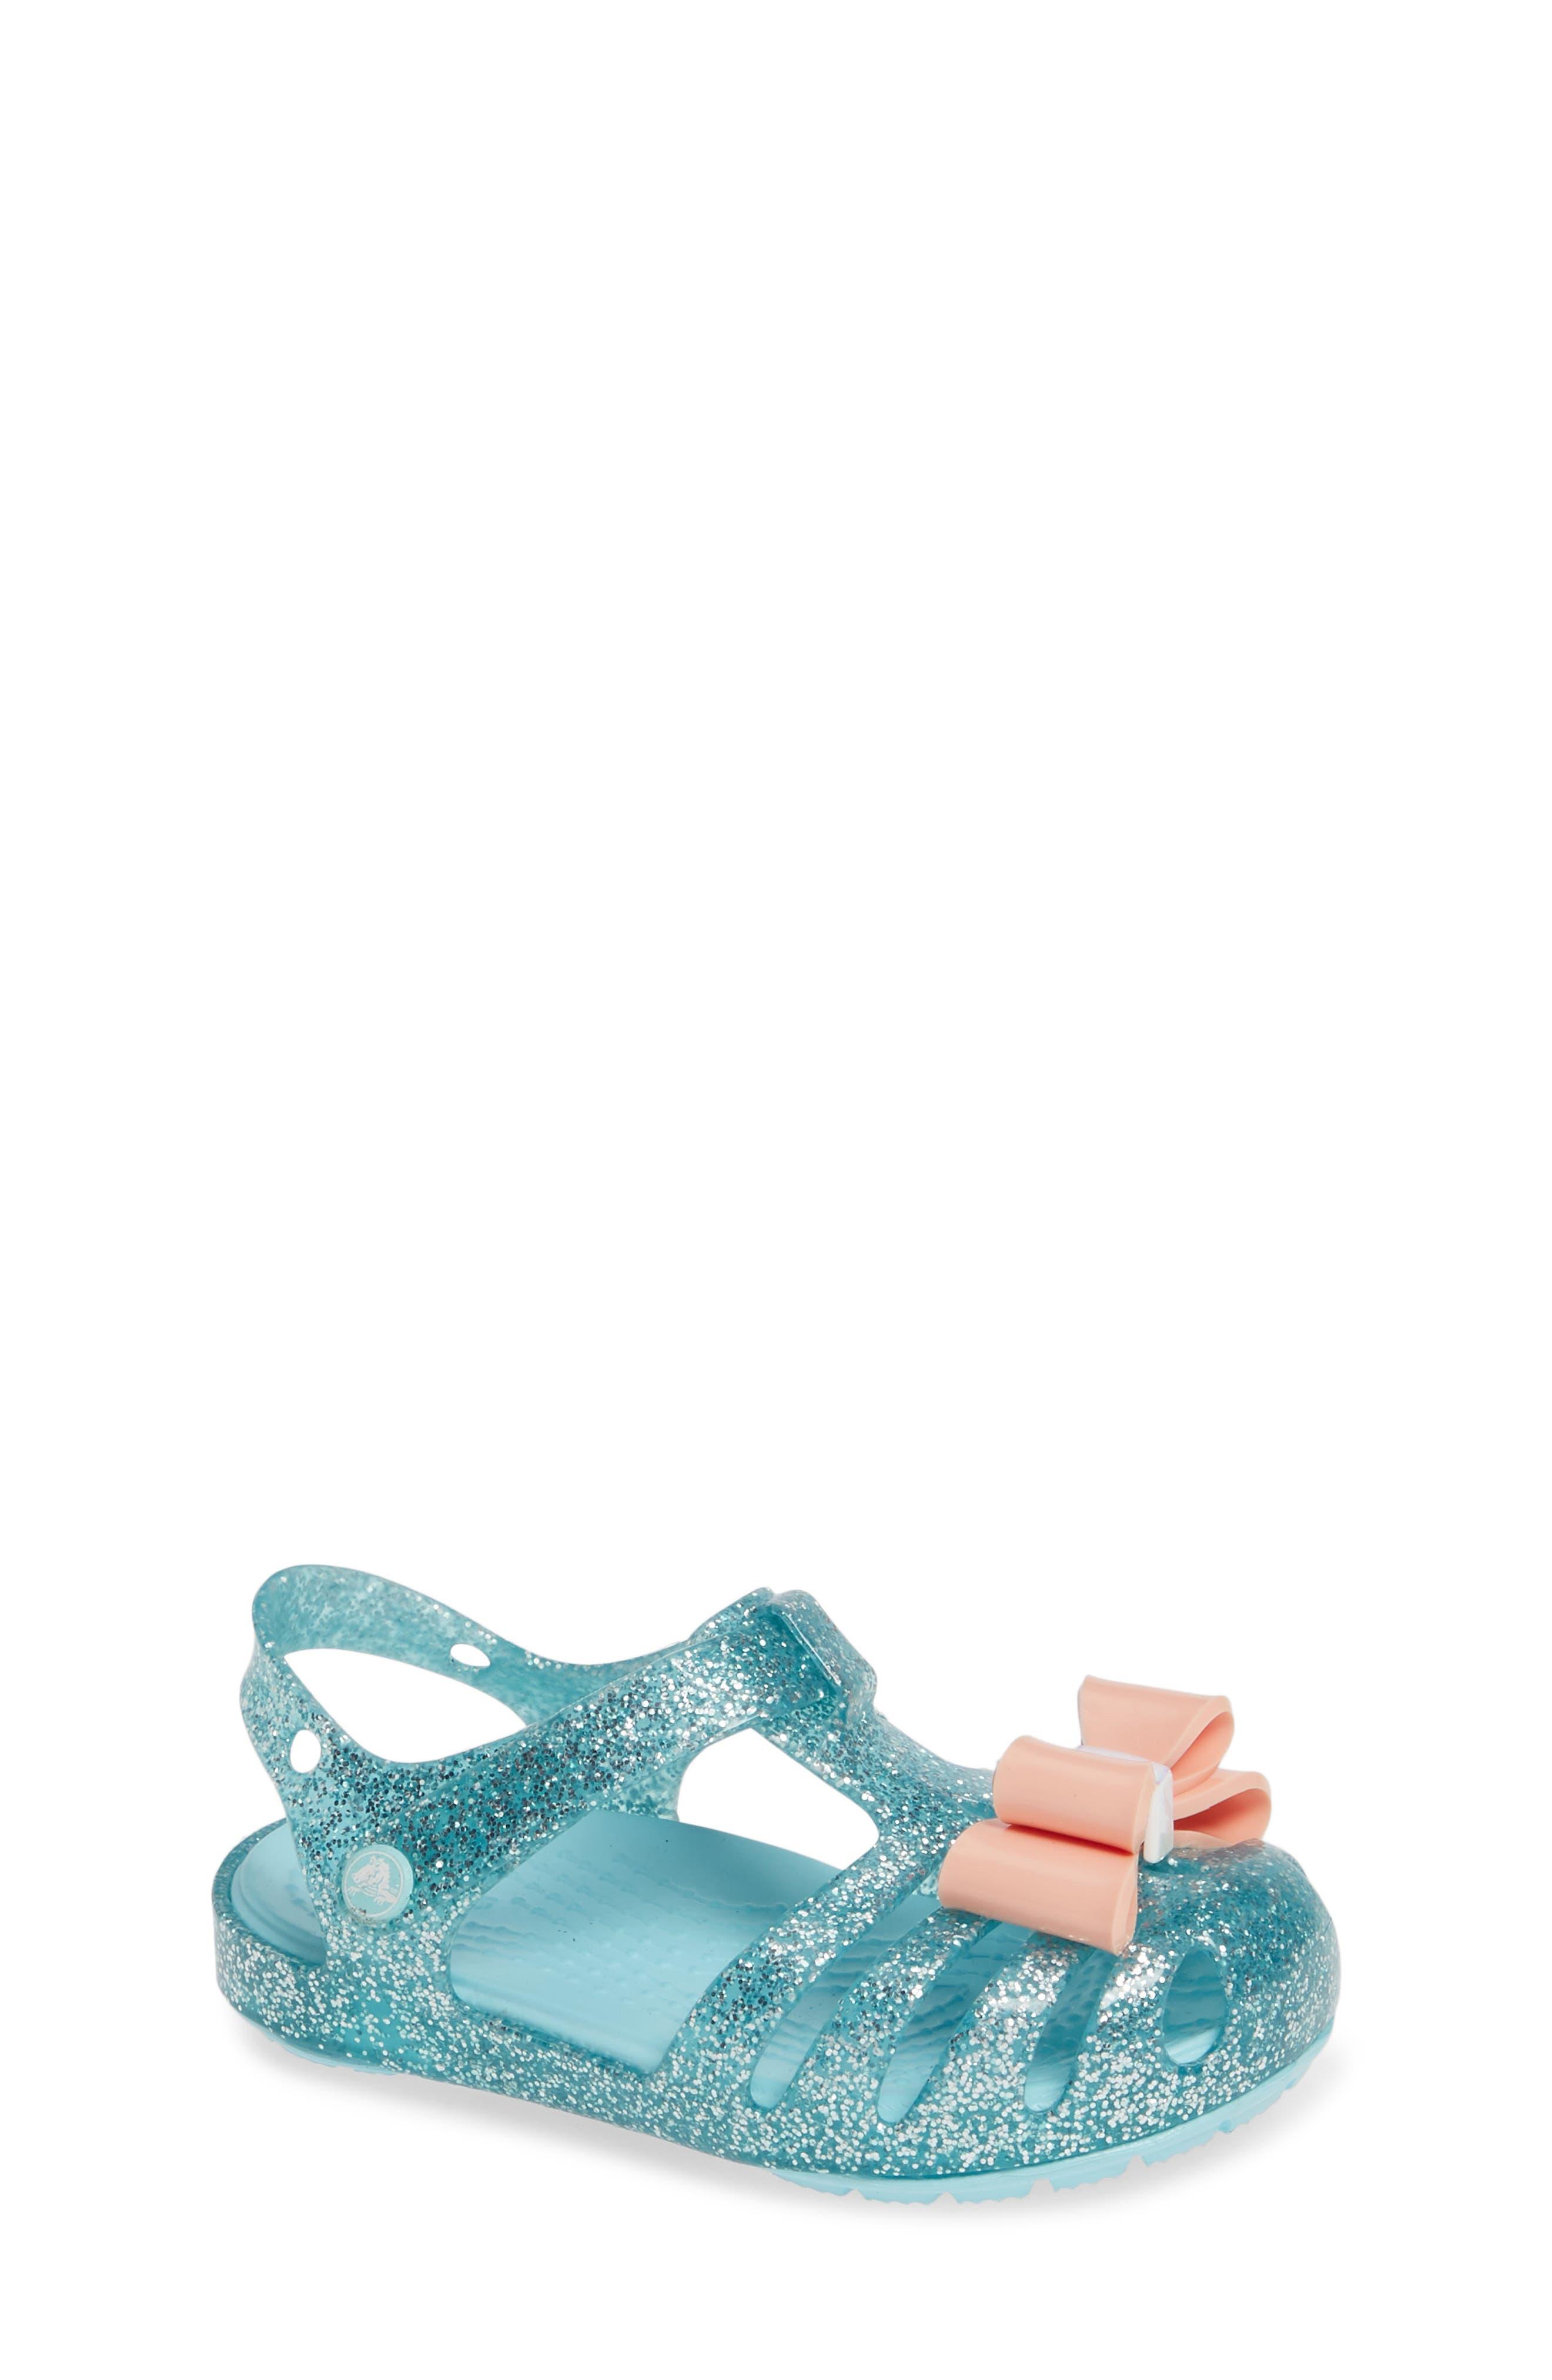 Isabella Bow Glitter Fisherman Sandal,                         Main,                         color, ICE BLUE